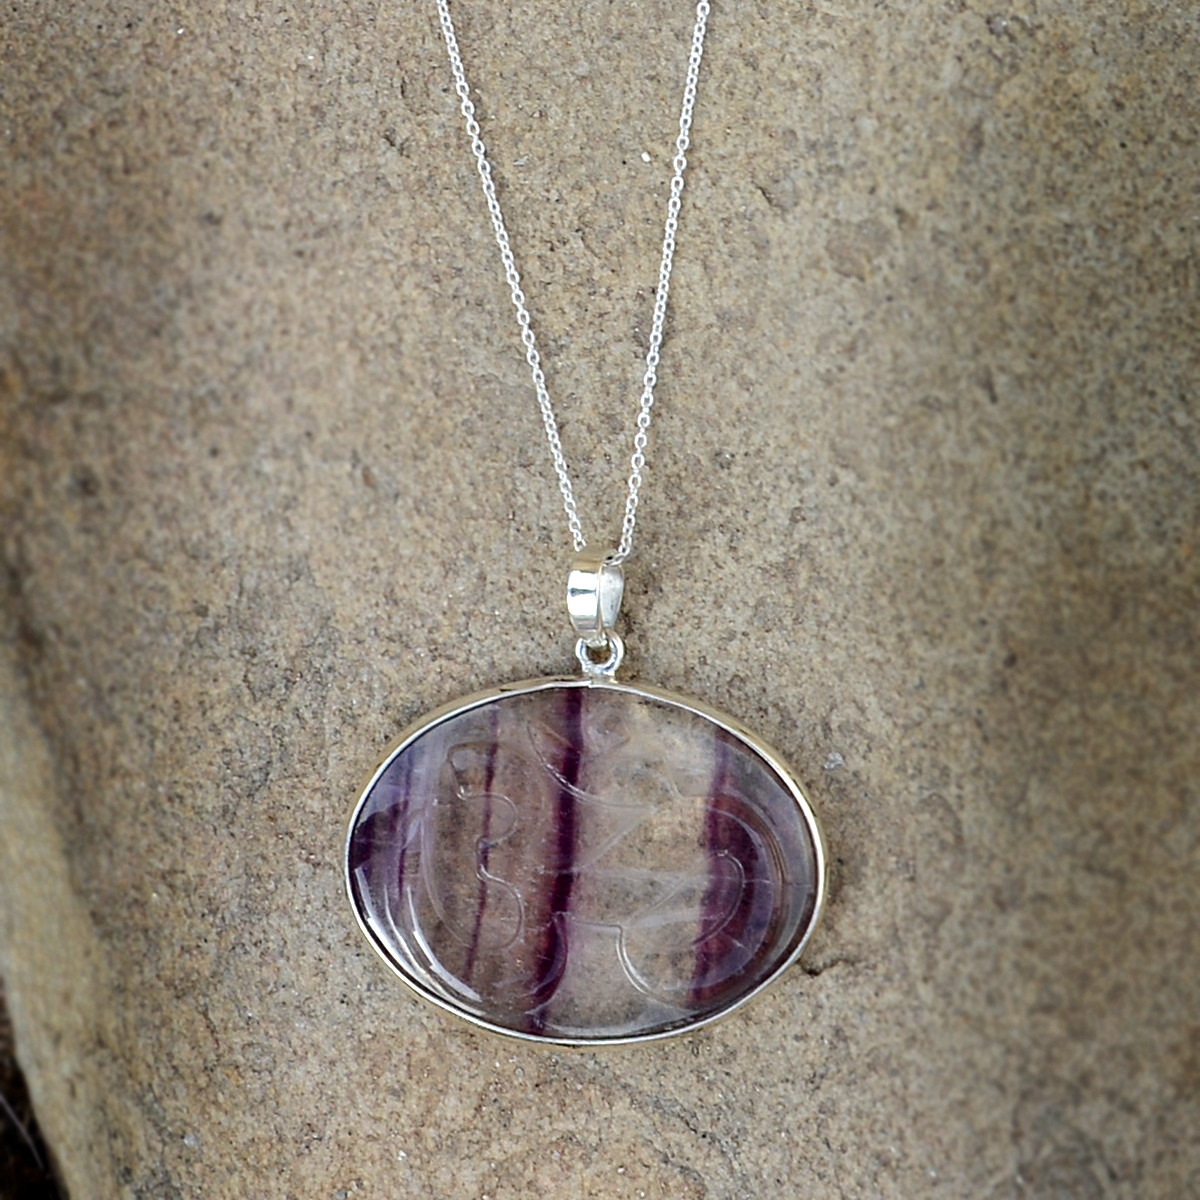 Fluorite Stone Silver Pendant Necklace PG-156268